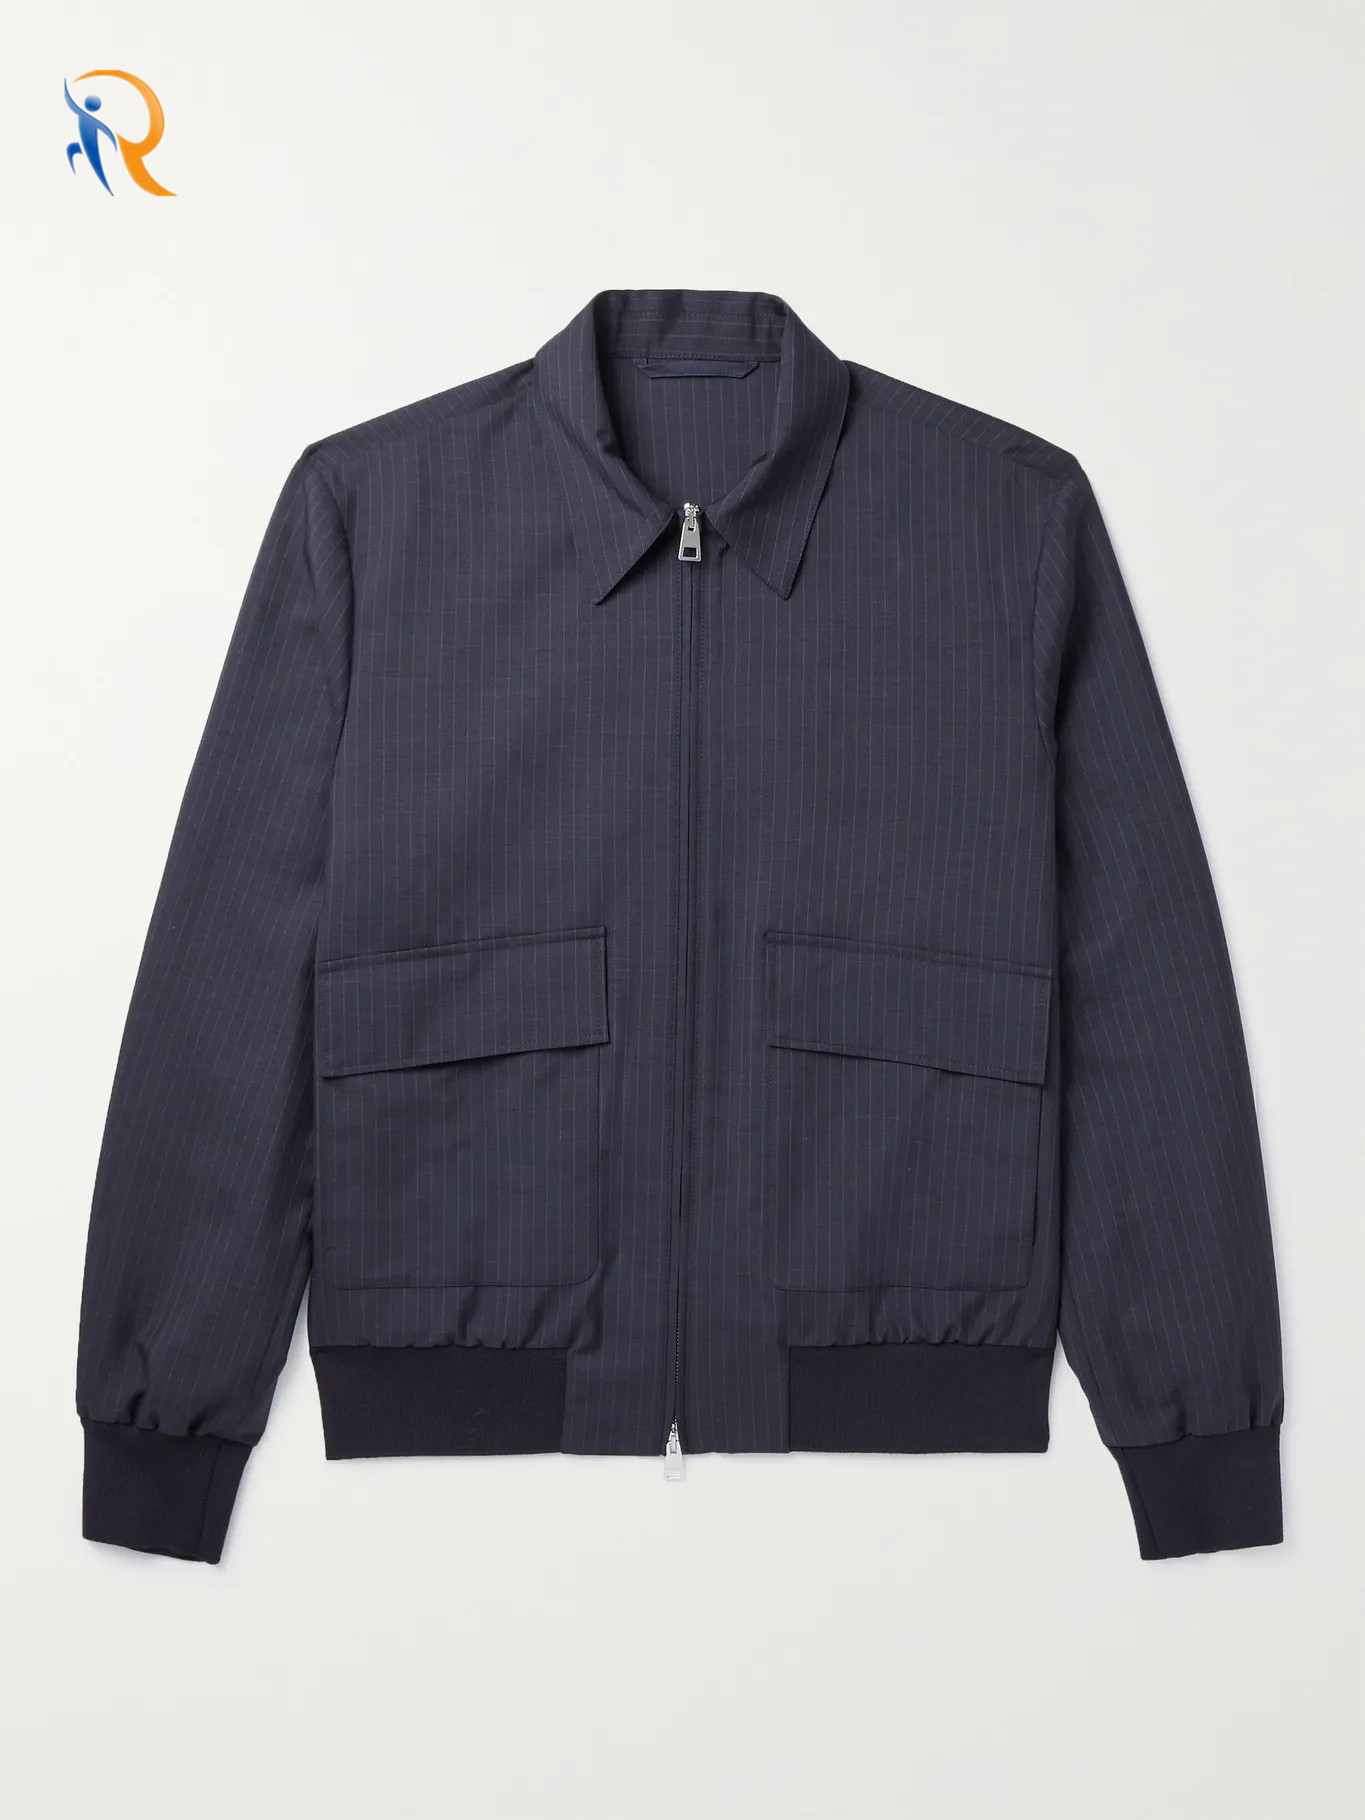 product-Ruiteng-Fashion Wholesale Pinstriped Blouson Jacket for Men 2022 Jkt-033-img